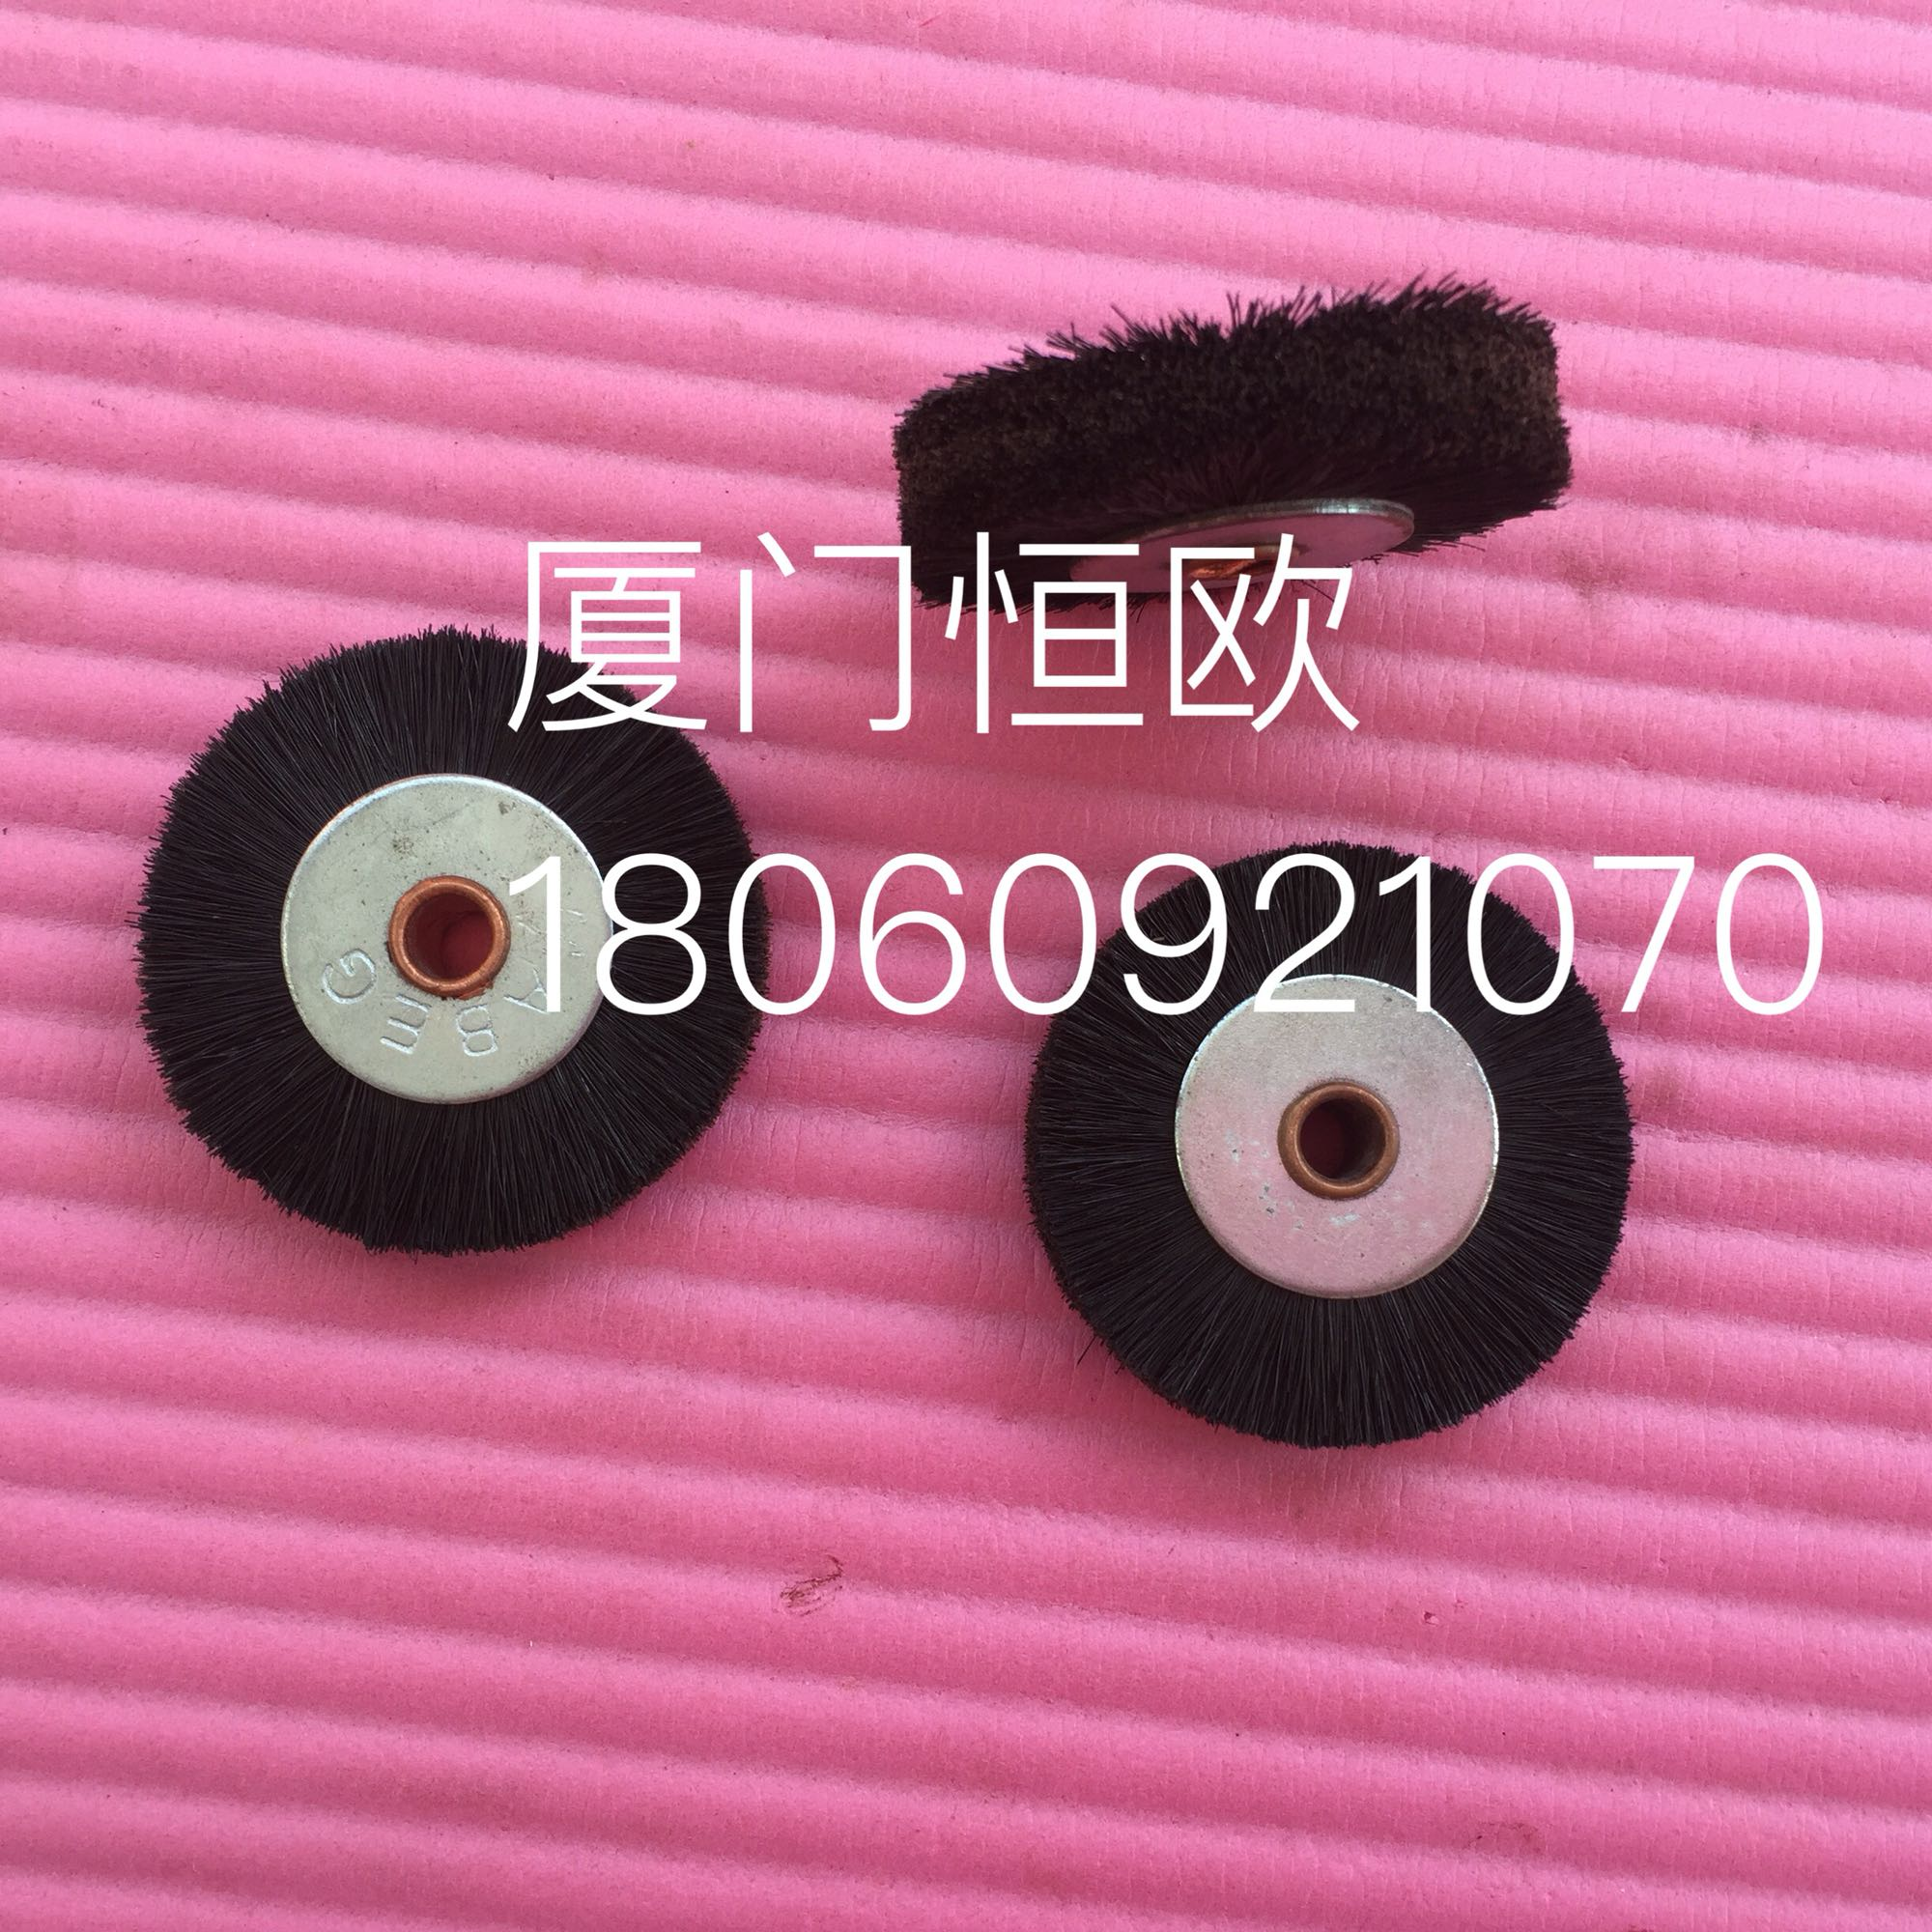 10 pieces Printing machine wool wheel paper wool wheel, brush wheel printing